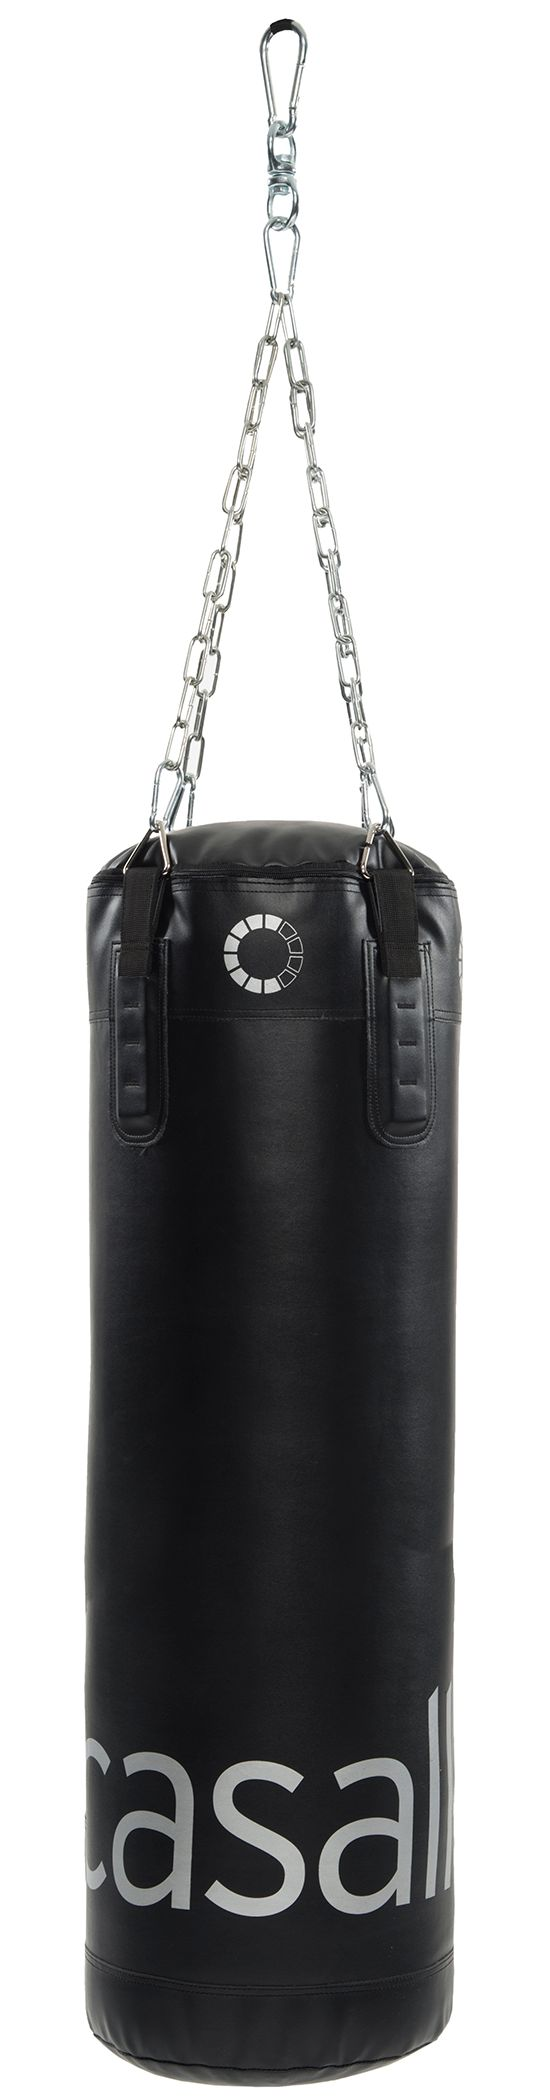 Boxing bag 100 cm